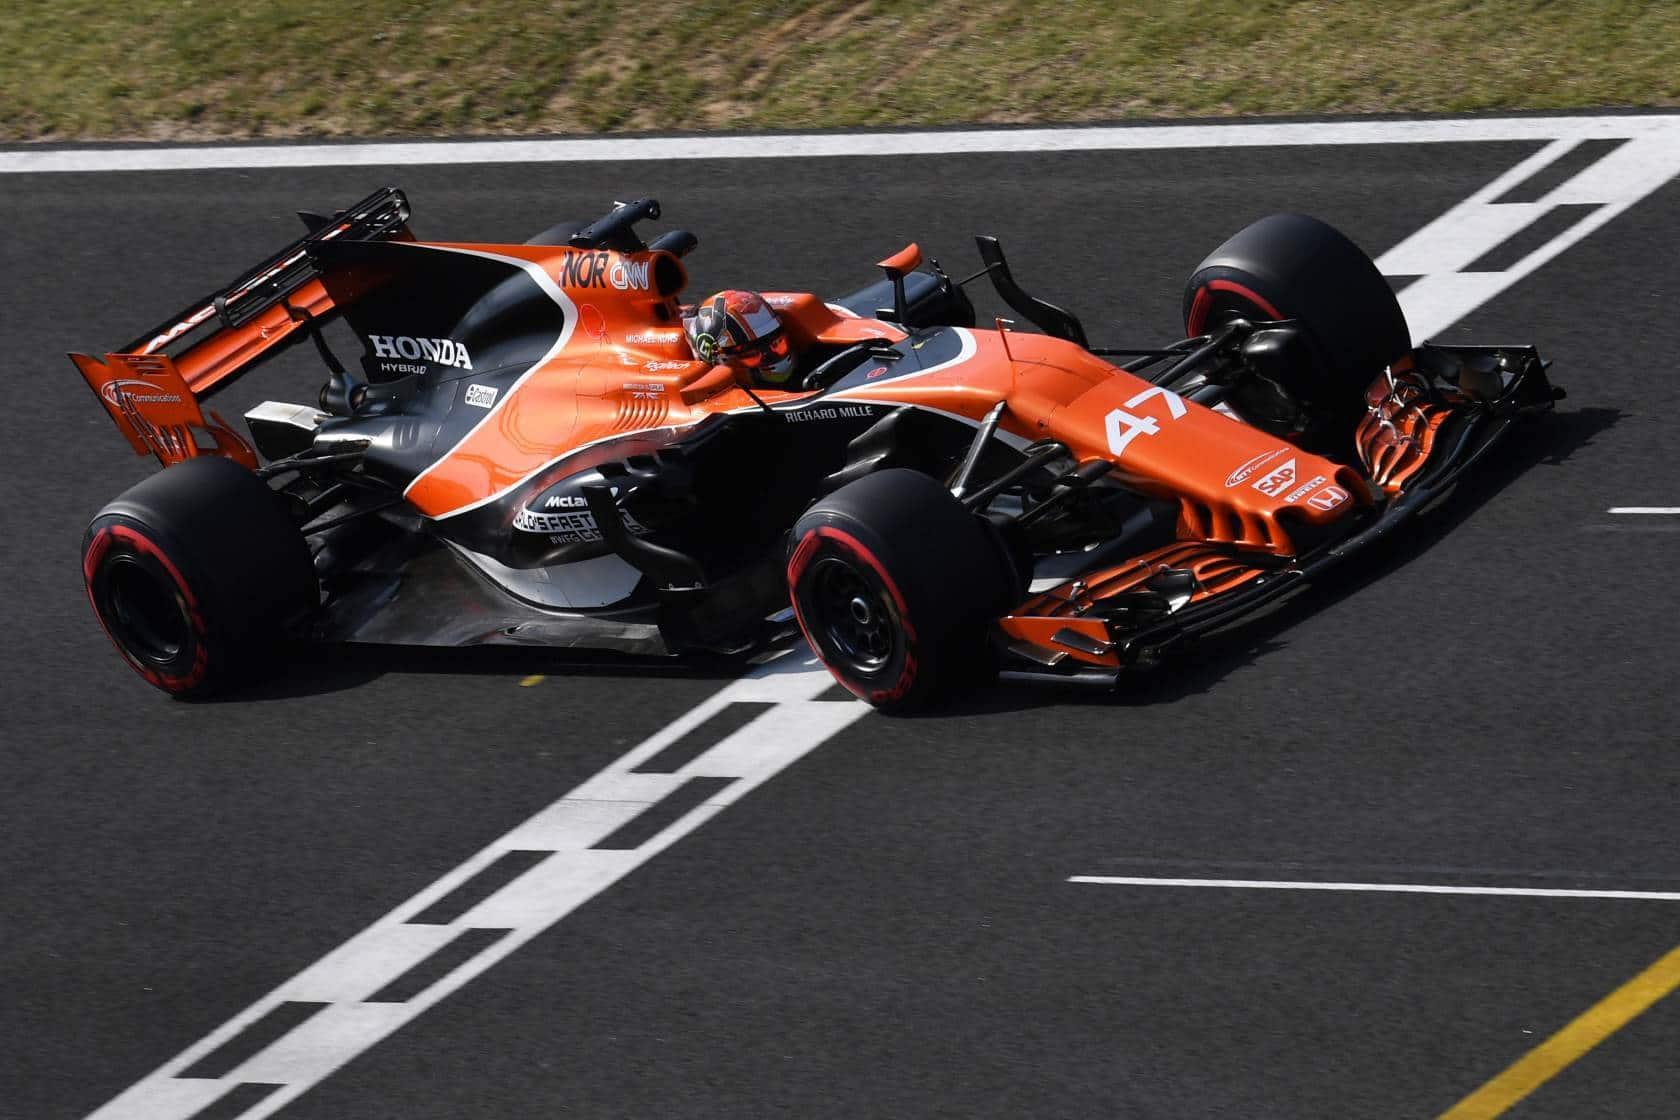 Lando Norriss McLaren Hungary F1 2017 test finish line Photo McLaren